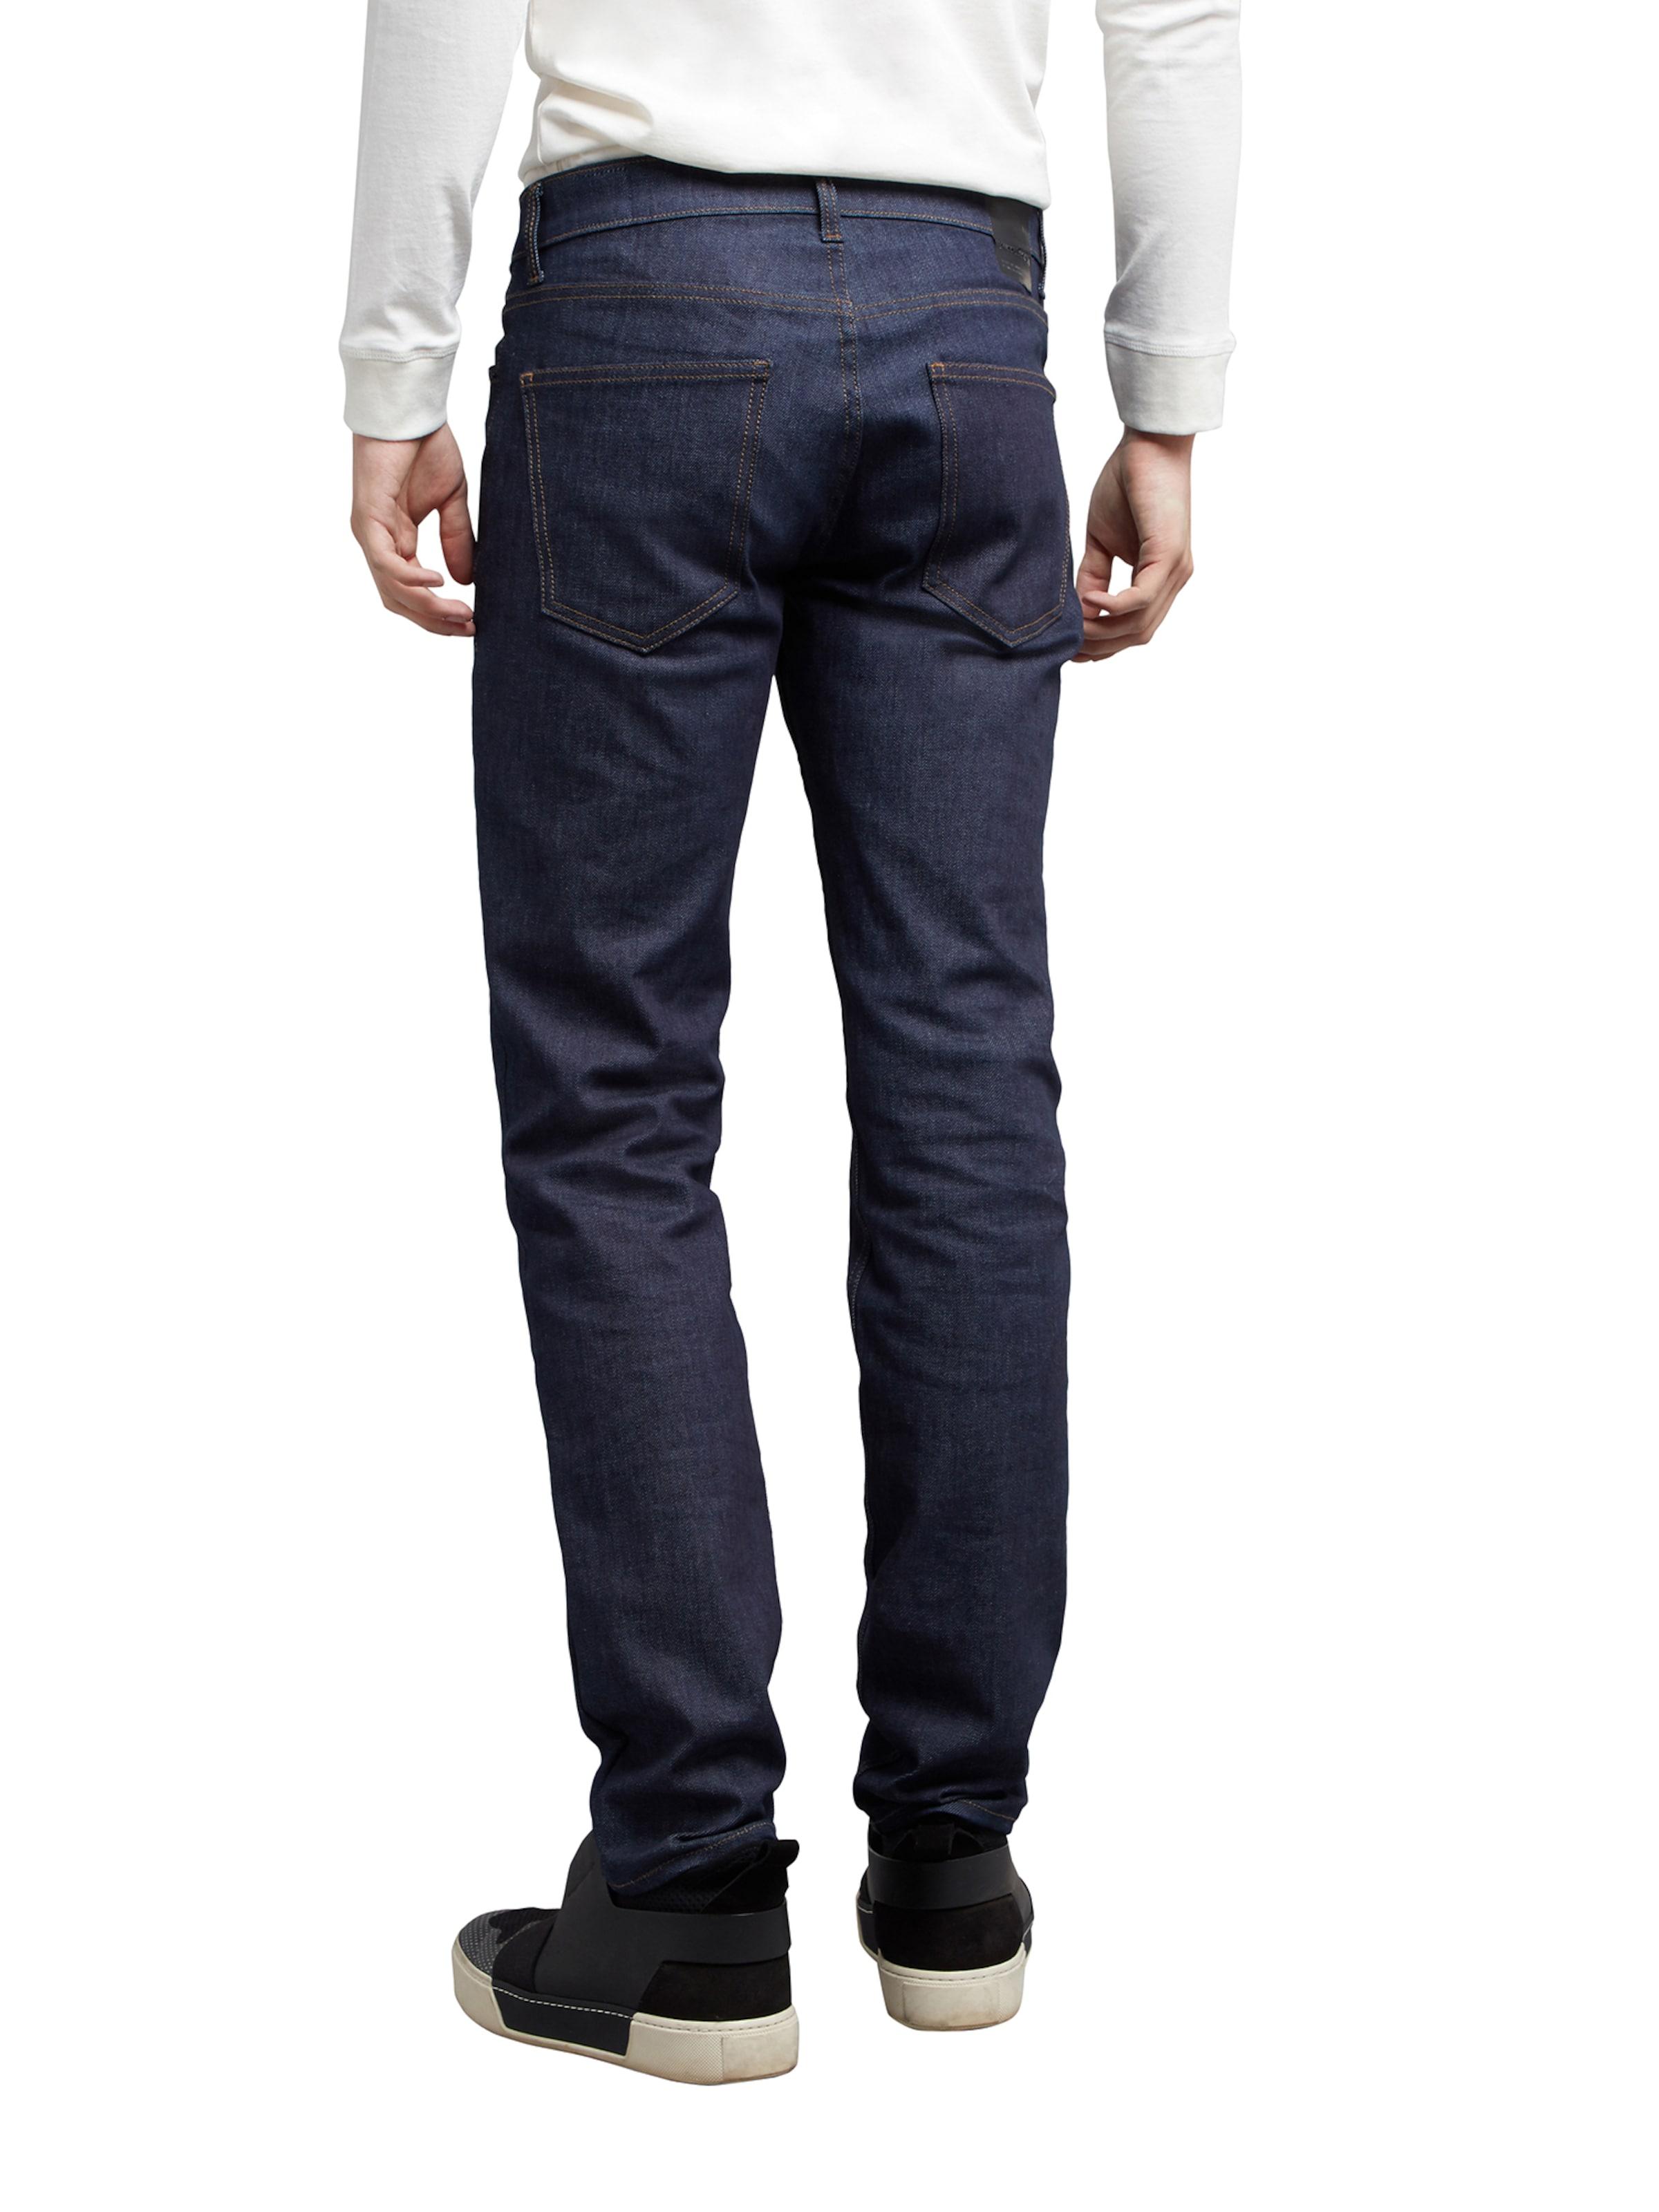 His In Denim Jeans Blue 'cliff' TlFK1J3c